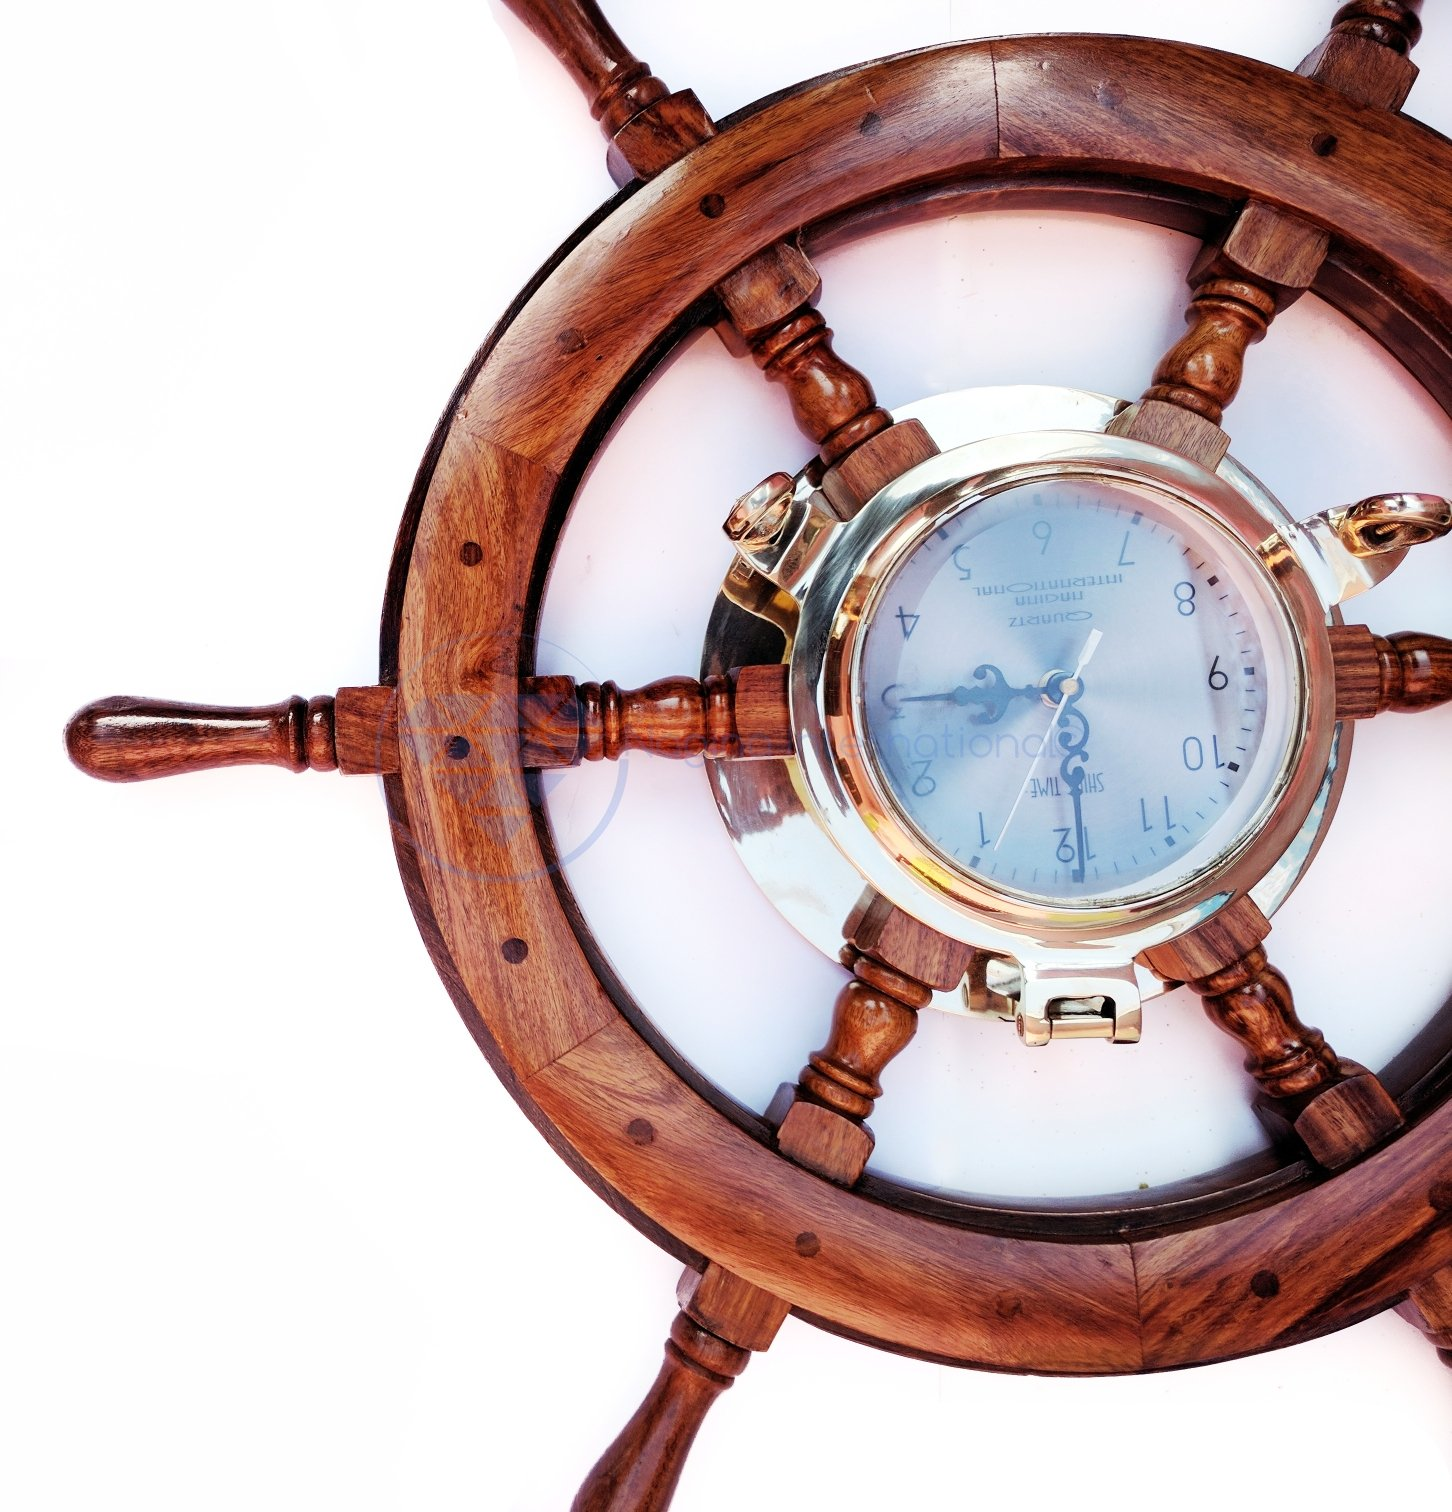 24'' Premium Porthole Clock Ship Wheel With Solid Teak Finish - Captain Maritime Beach Home Decor Gift - Nagina International